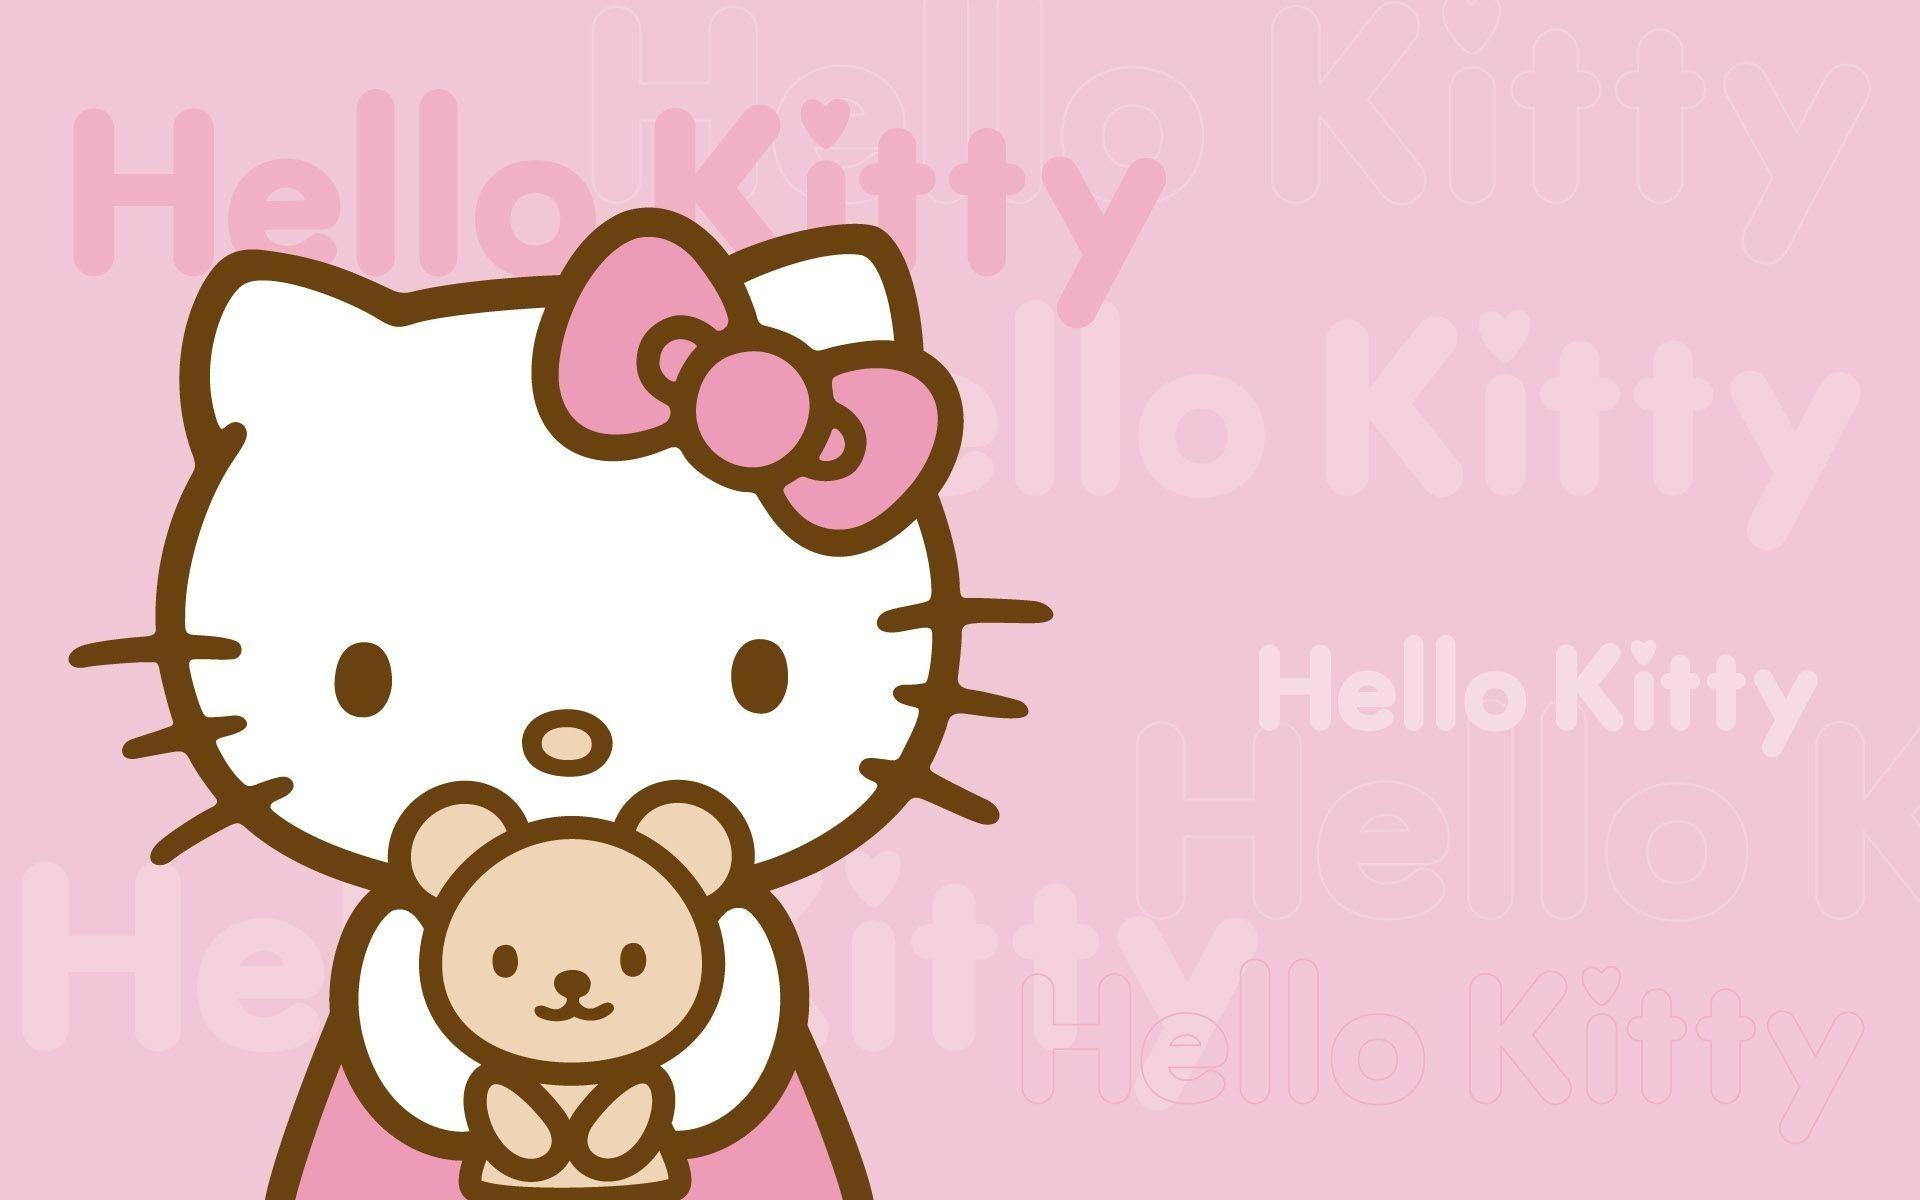 hello kitty wallpaper - baltana